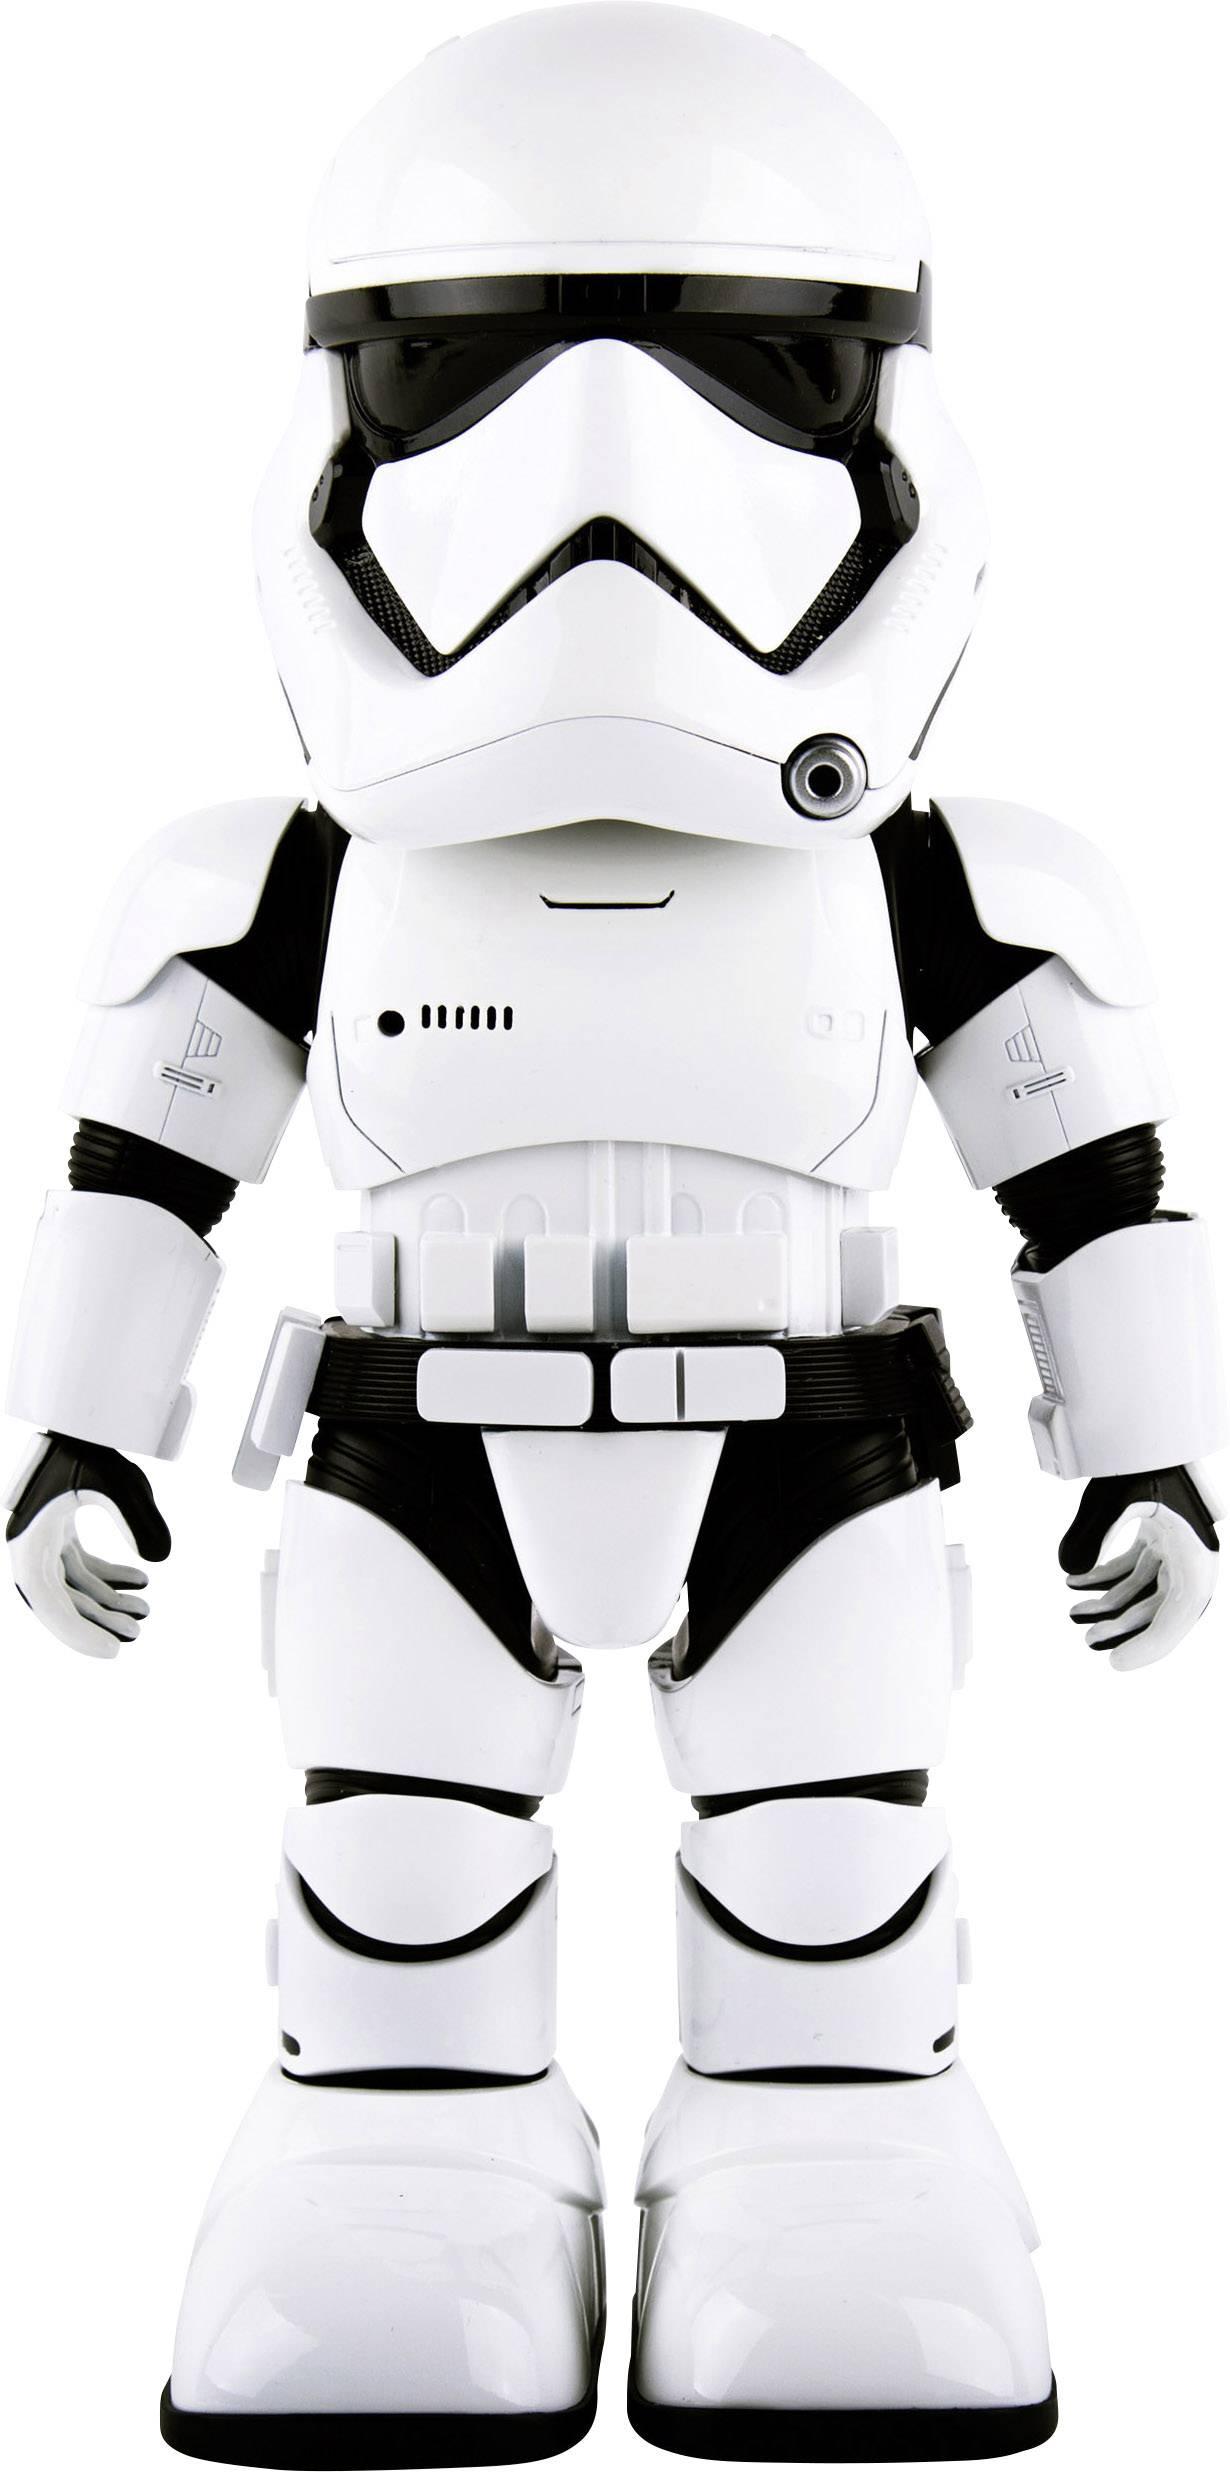 Humanoidný robot Ubtech Star Wars Stormtrooper, výška 234 mm